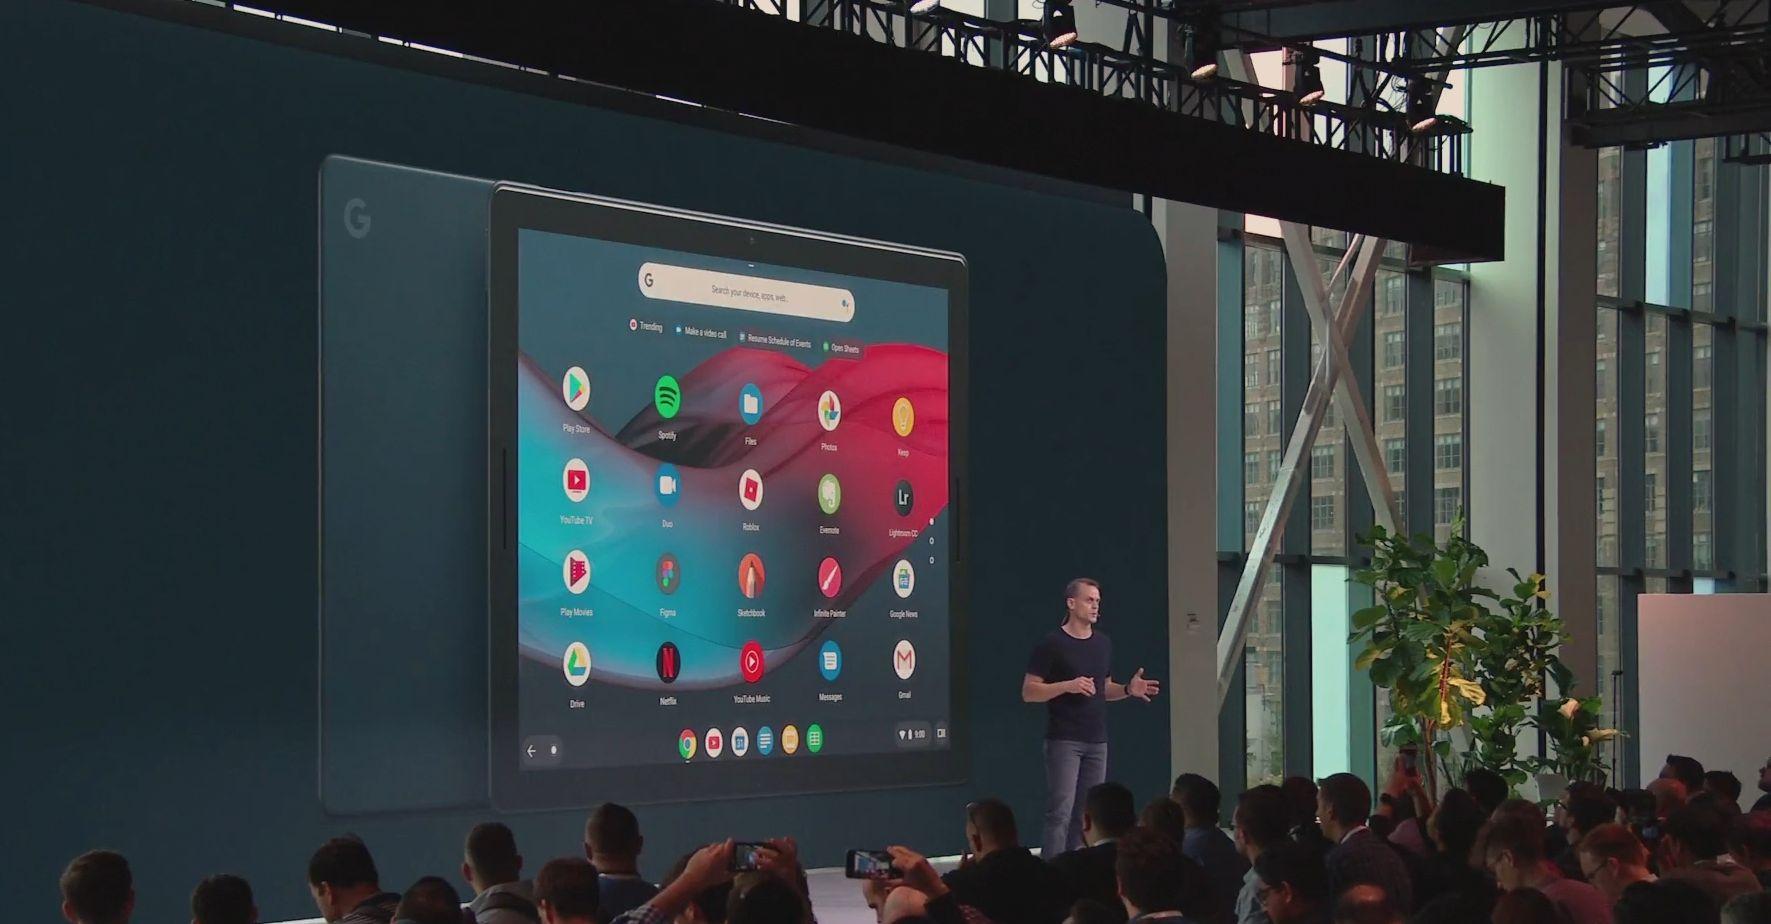 New Google Pixel Slate tablet represents evolution of Chrome